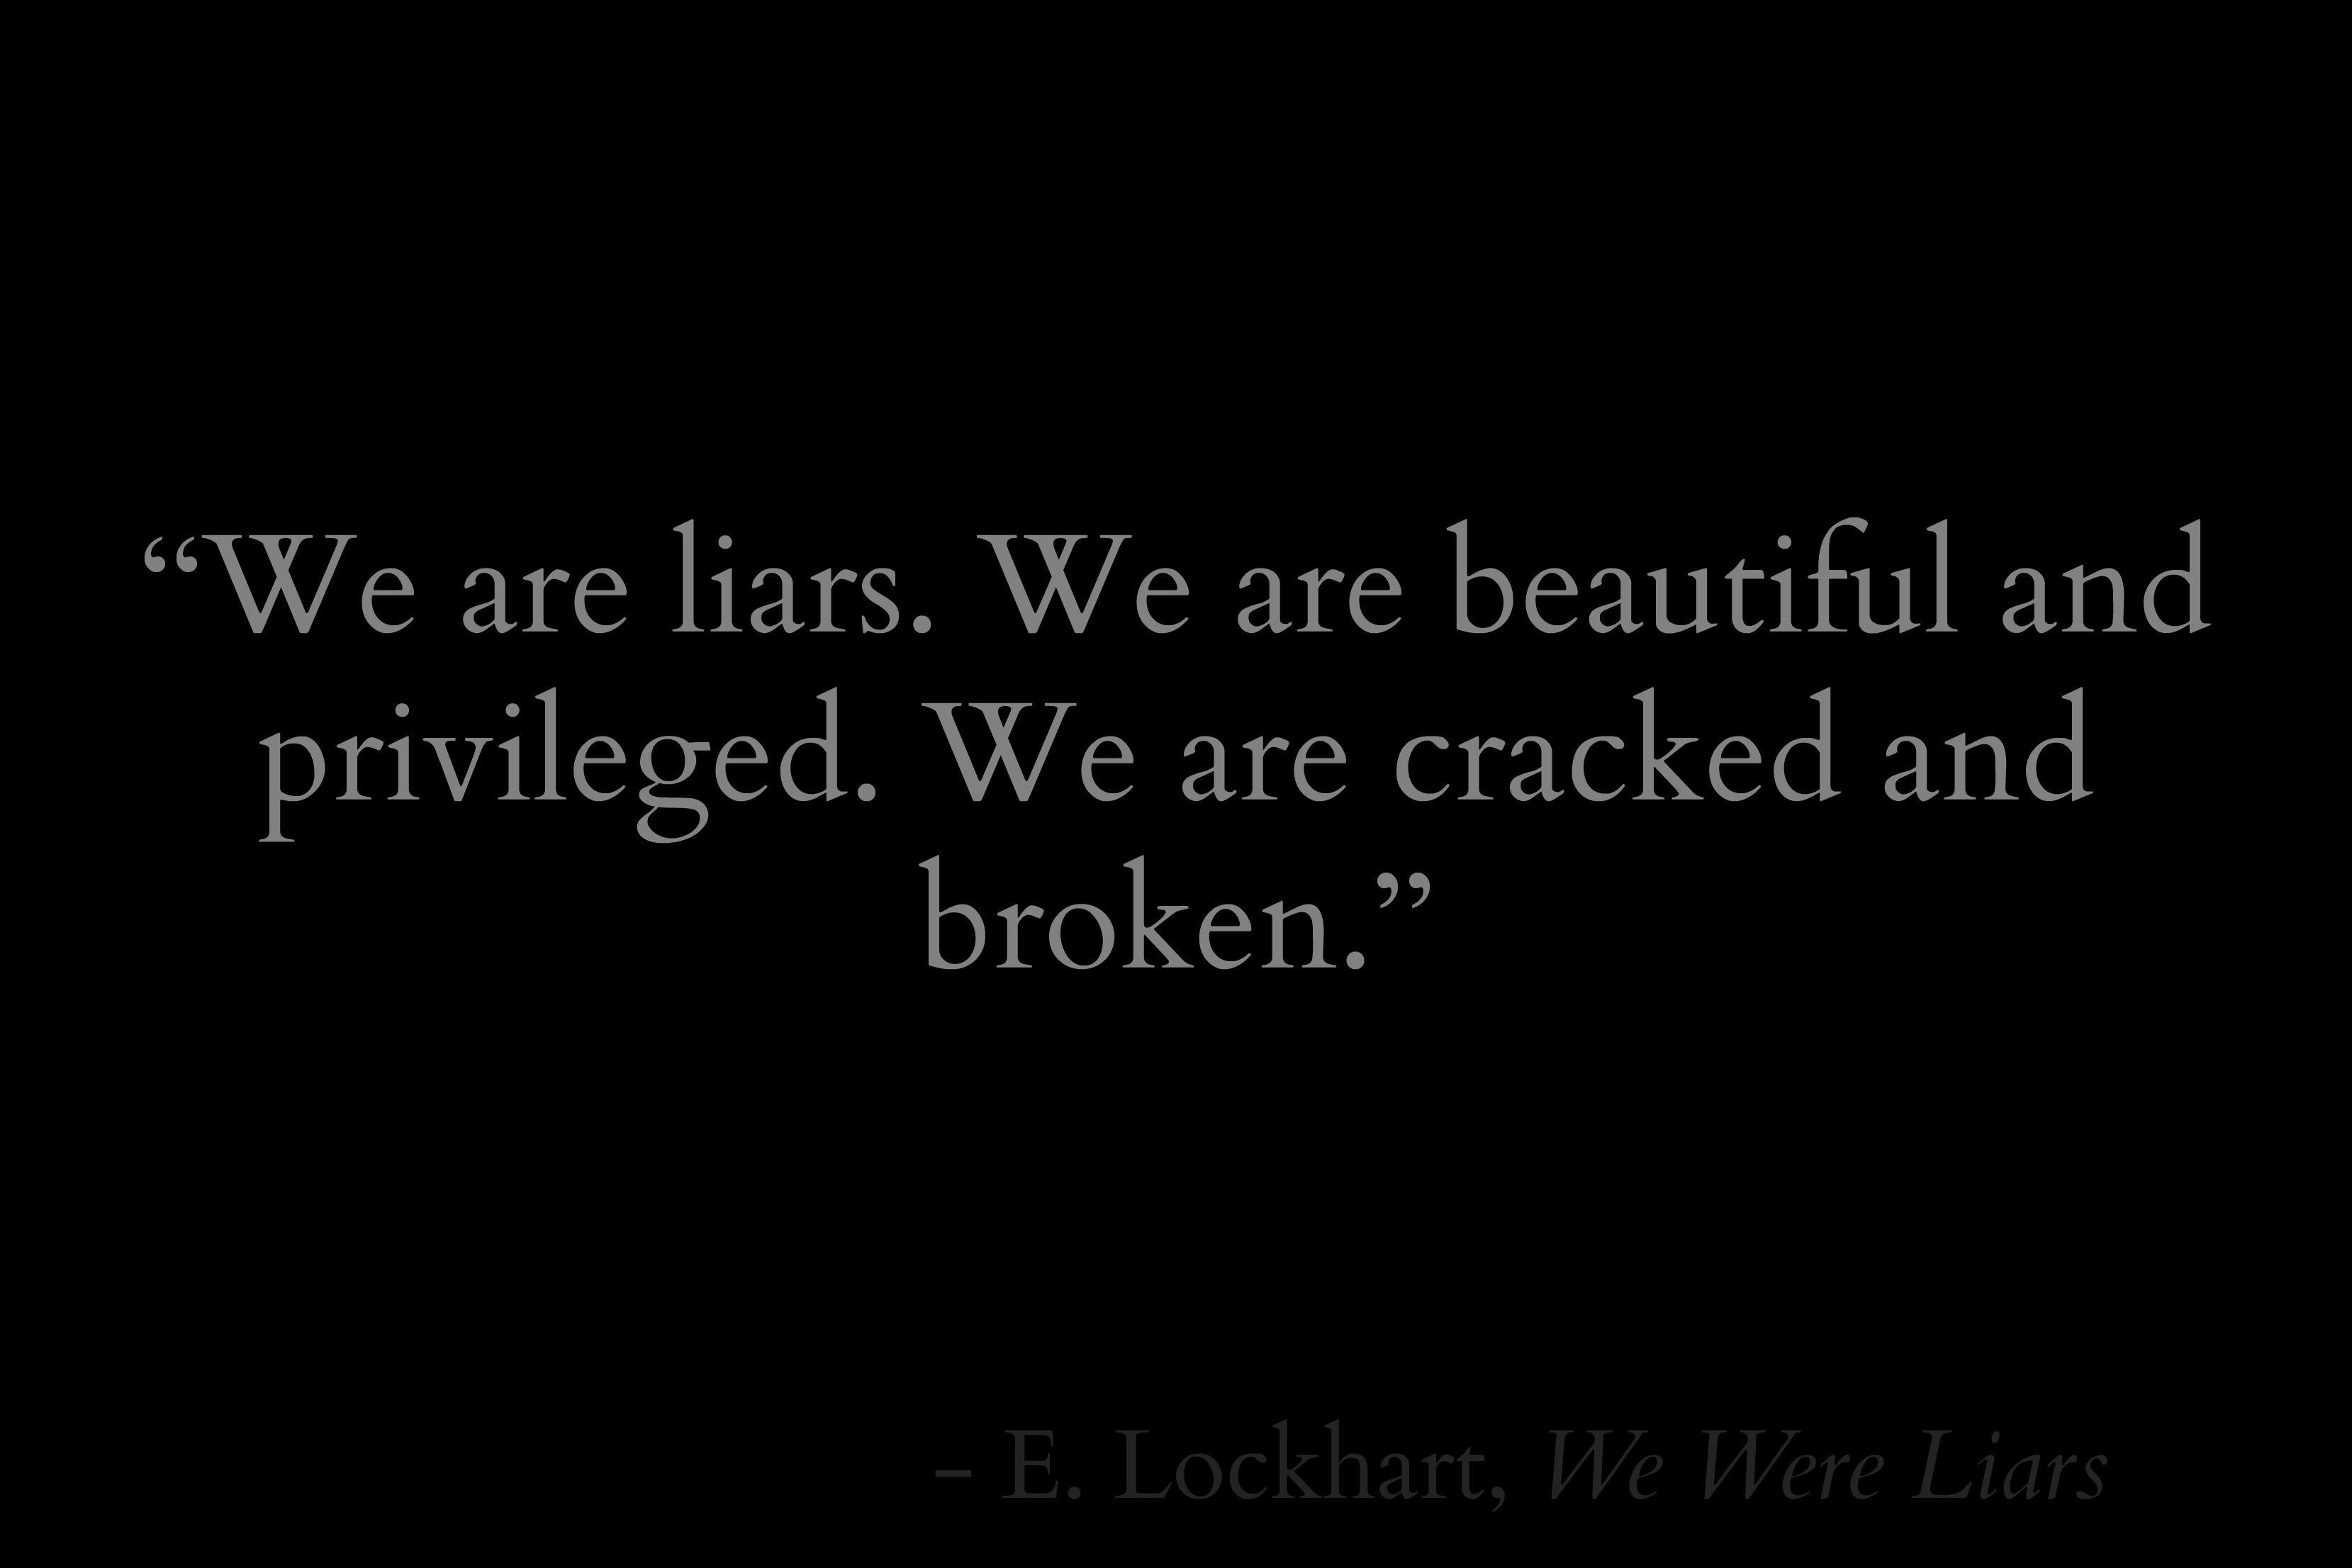 E. Lockhart, We Were Liars Quote